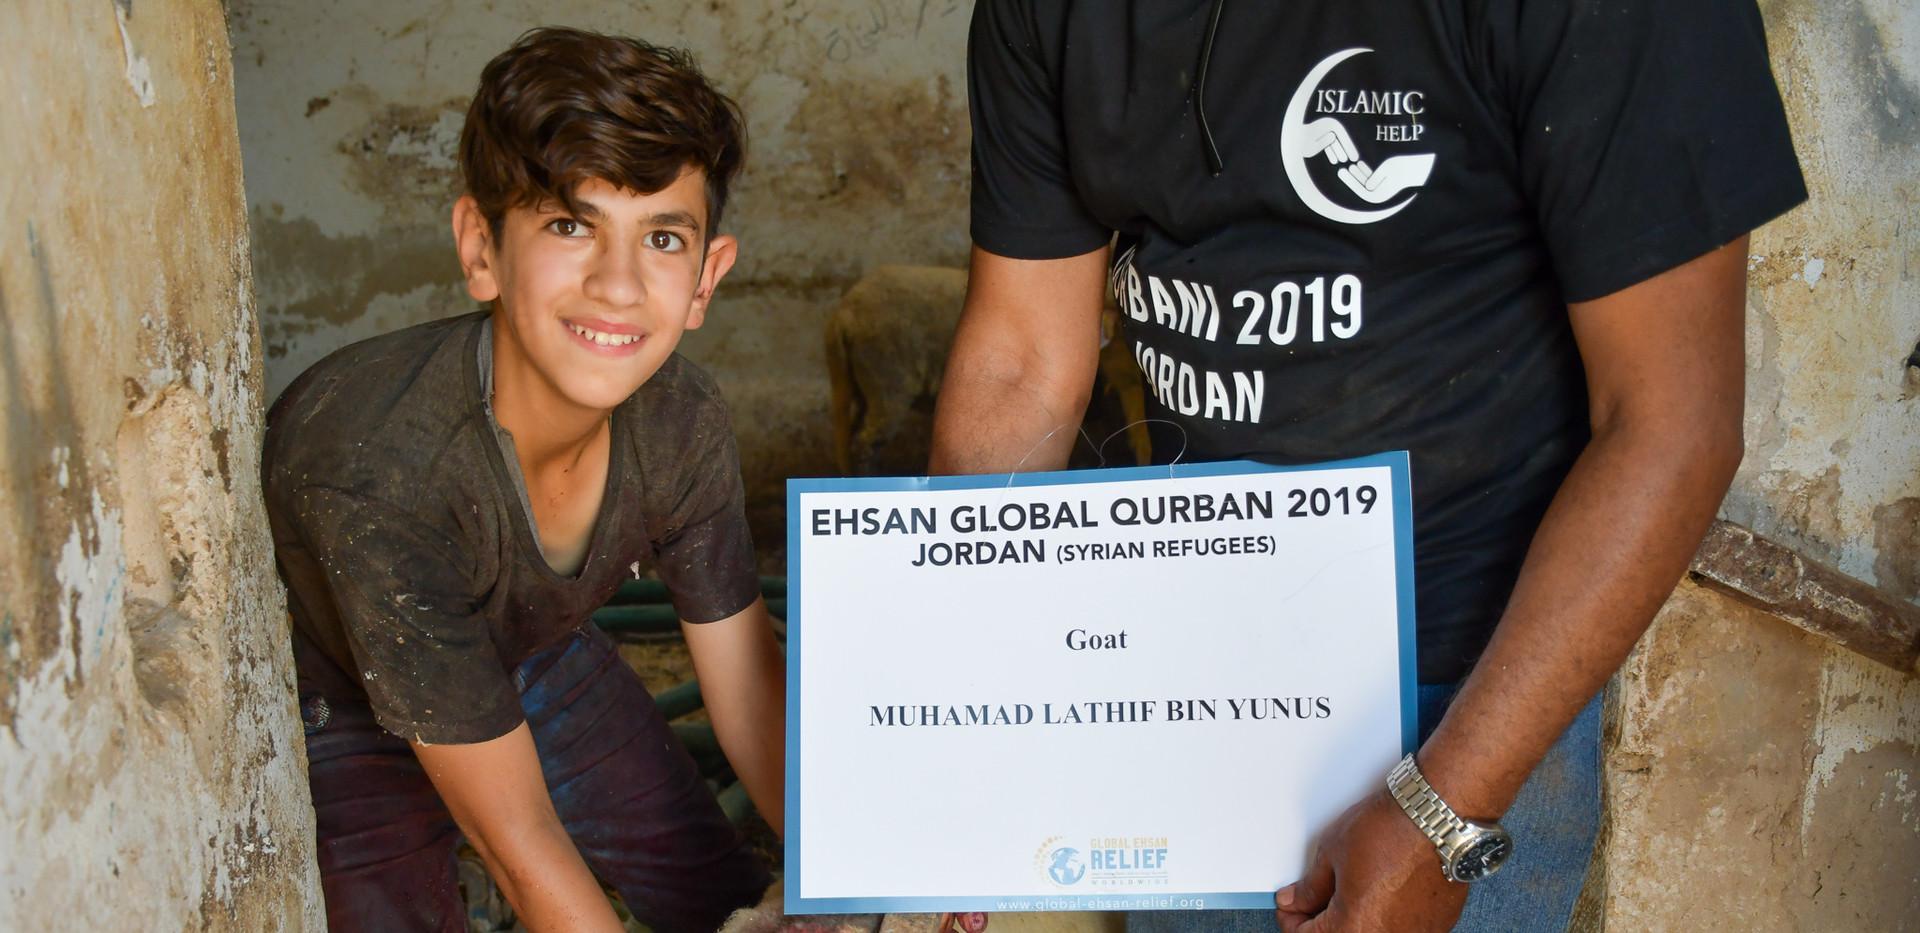 Syrians in Jordan__Qurban 2019